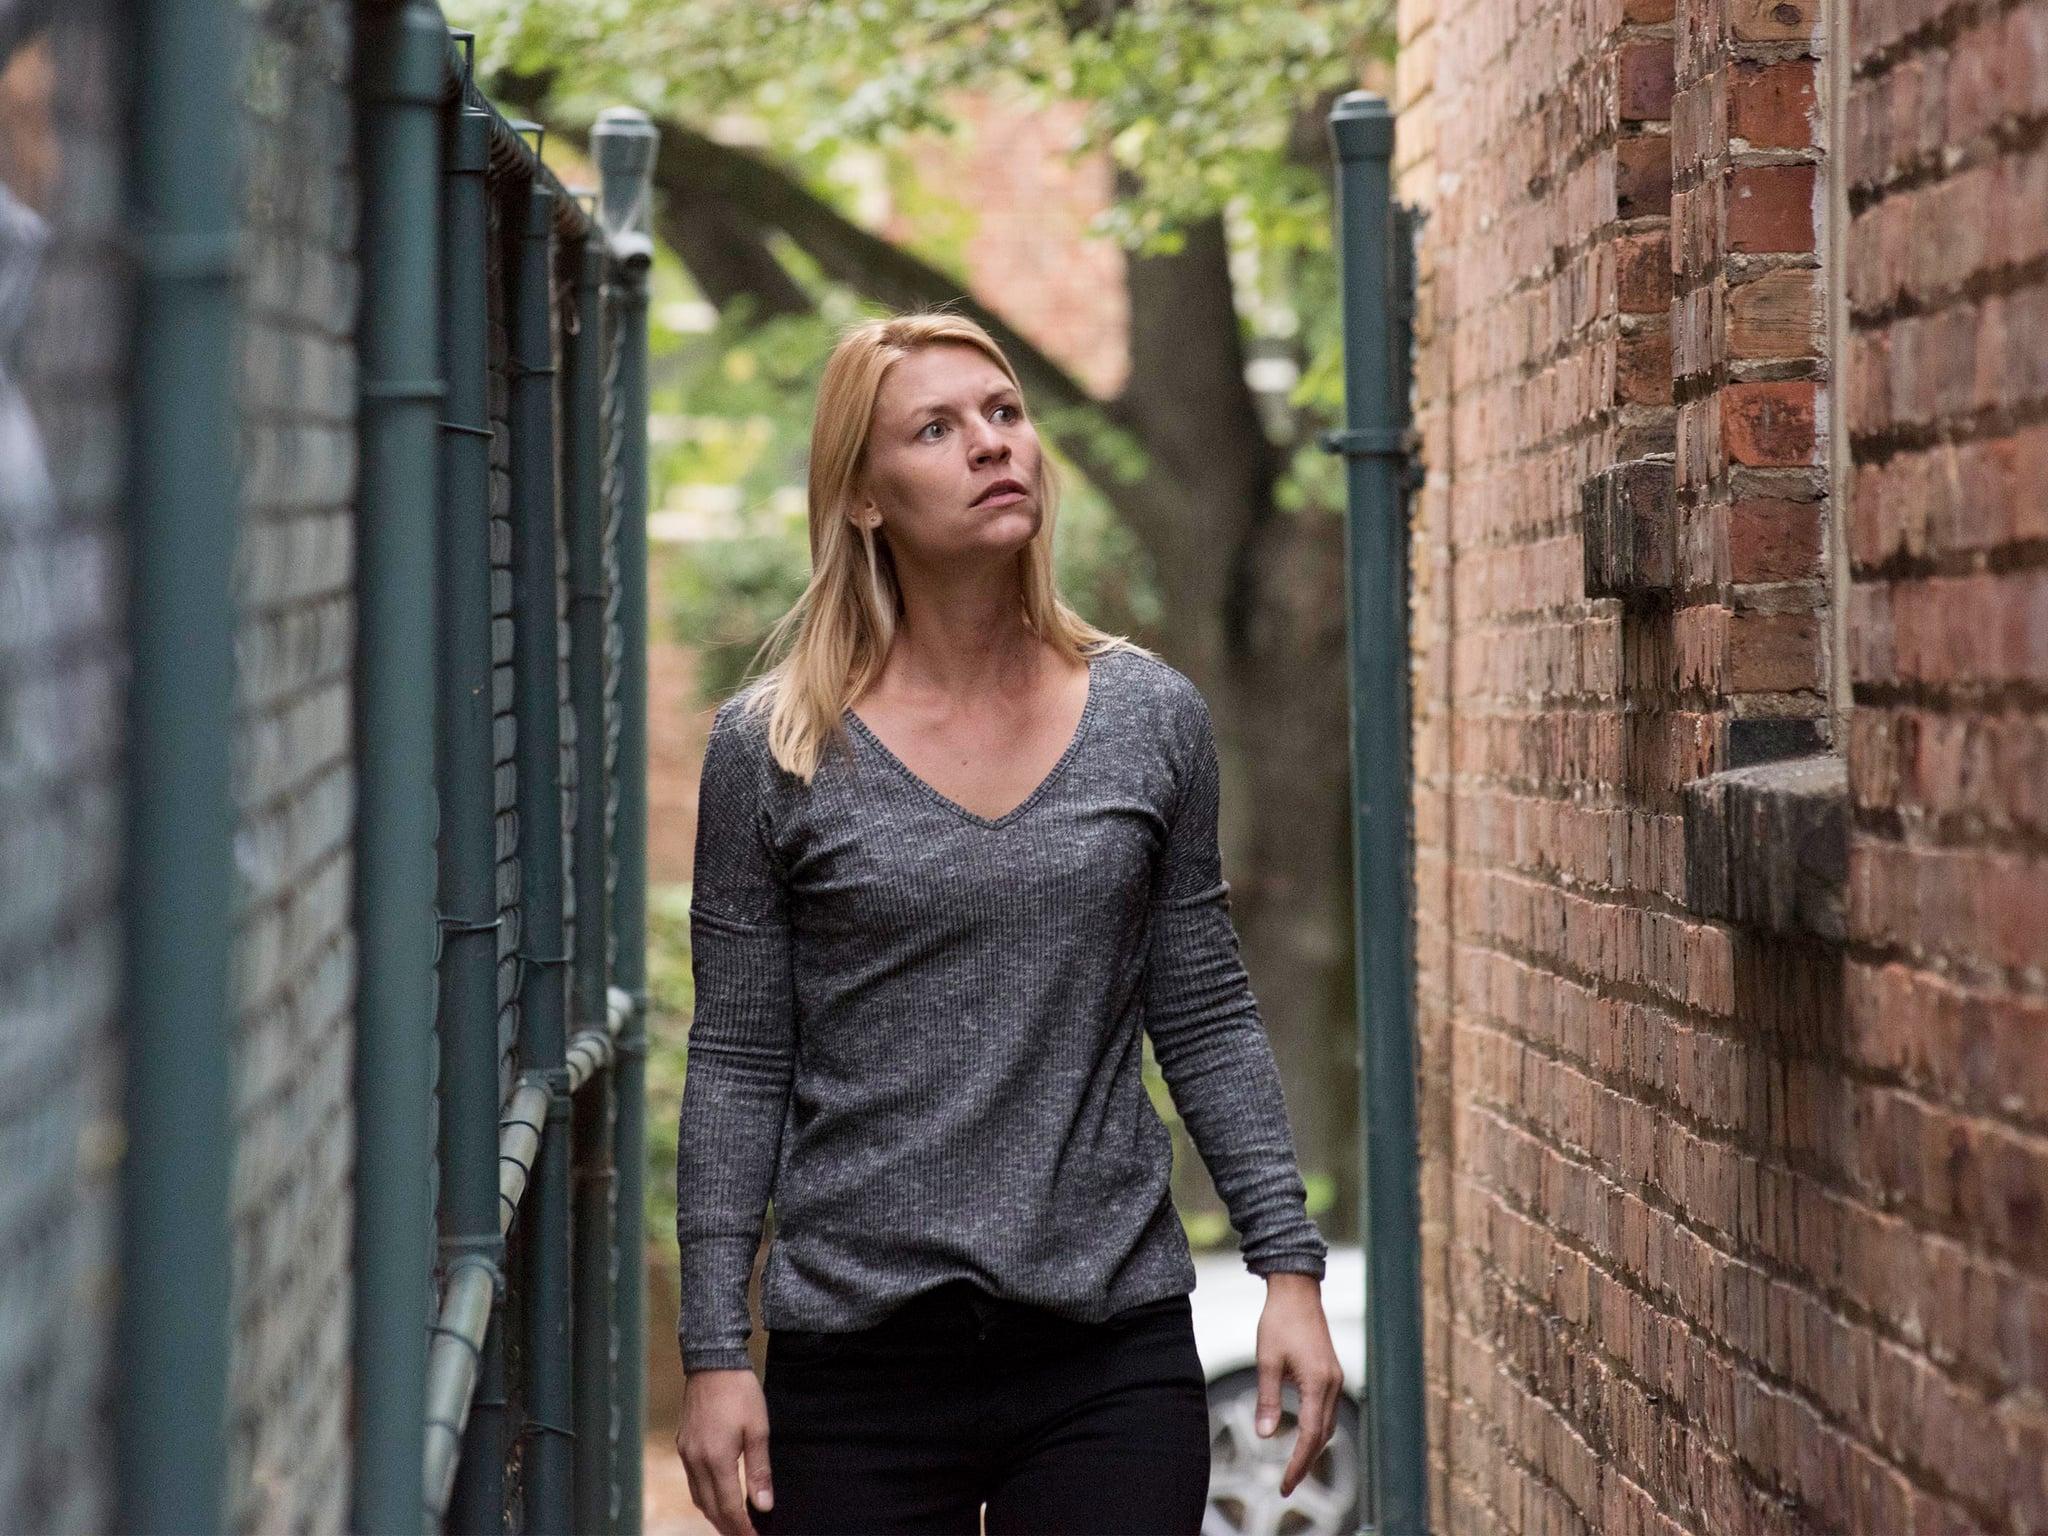 HOMELAND, Claire Danes, 'Rebel Rebel', (Season 7, ep. 702, aired Feb. 18, 2018). photo: Antony Platt / Showtime Network / Courtesy: Everett Collection